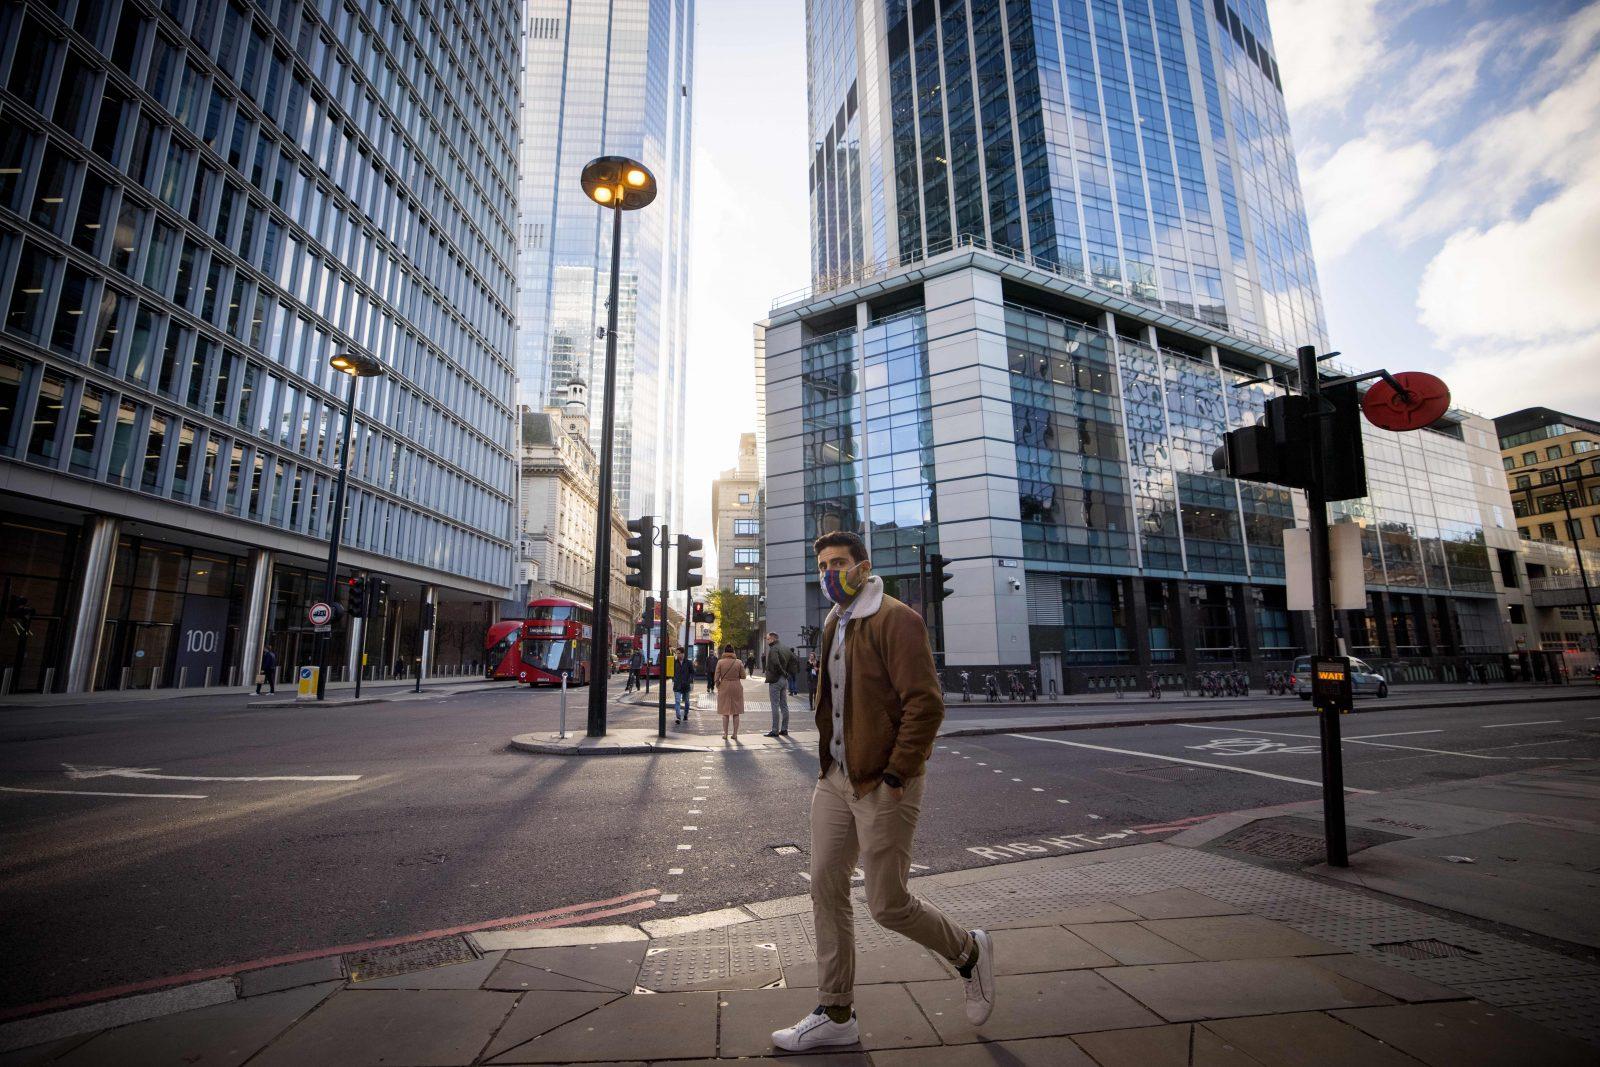 UK regulators prepared to intervene if Brexit disrupts markets, says FCA